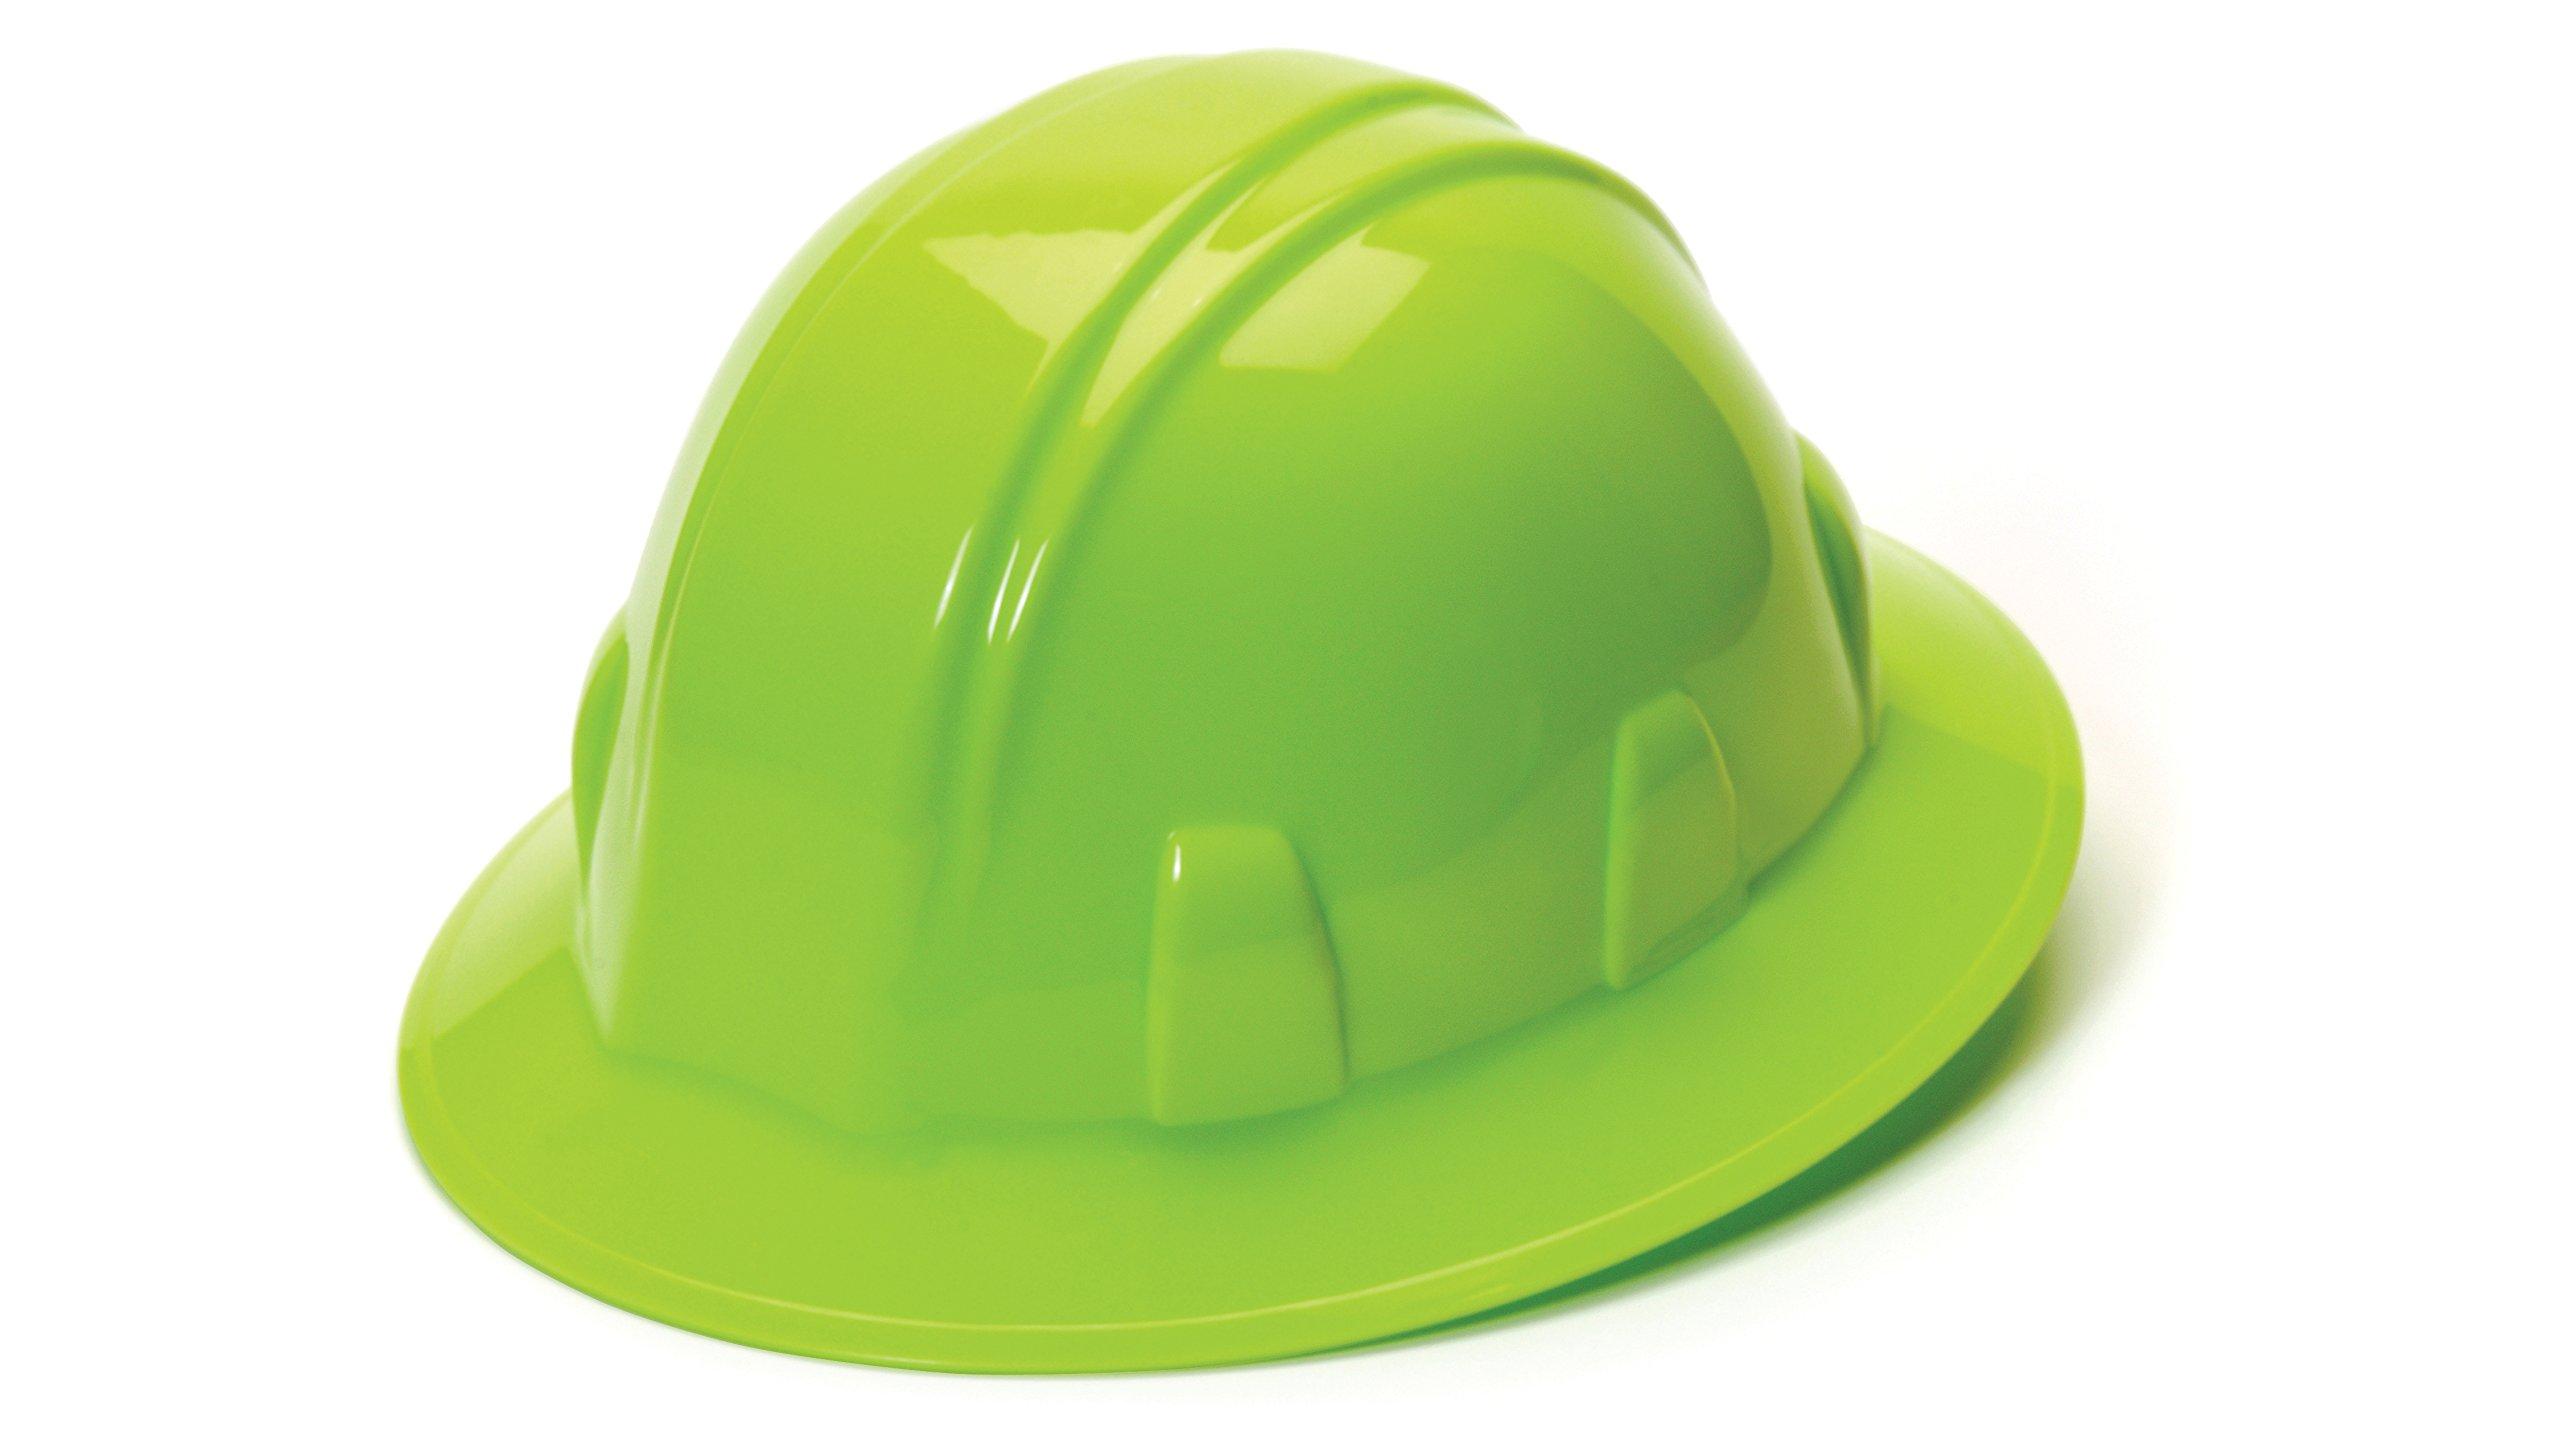 Pyramex Full Brim Ratchet Suspension Hard Hat, Hi Vis Lime, 4 Point Ratchet Suspension